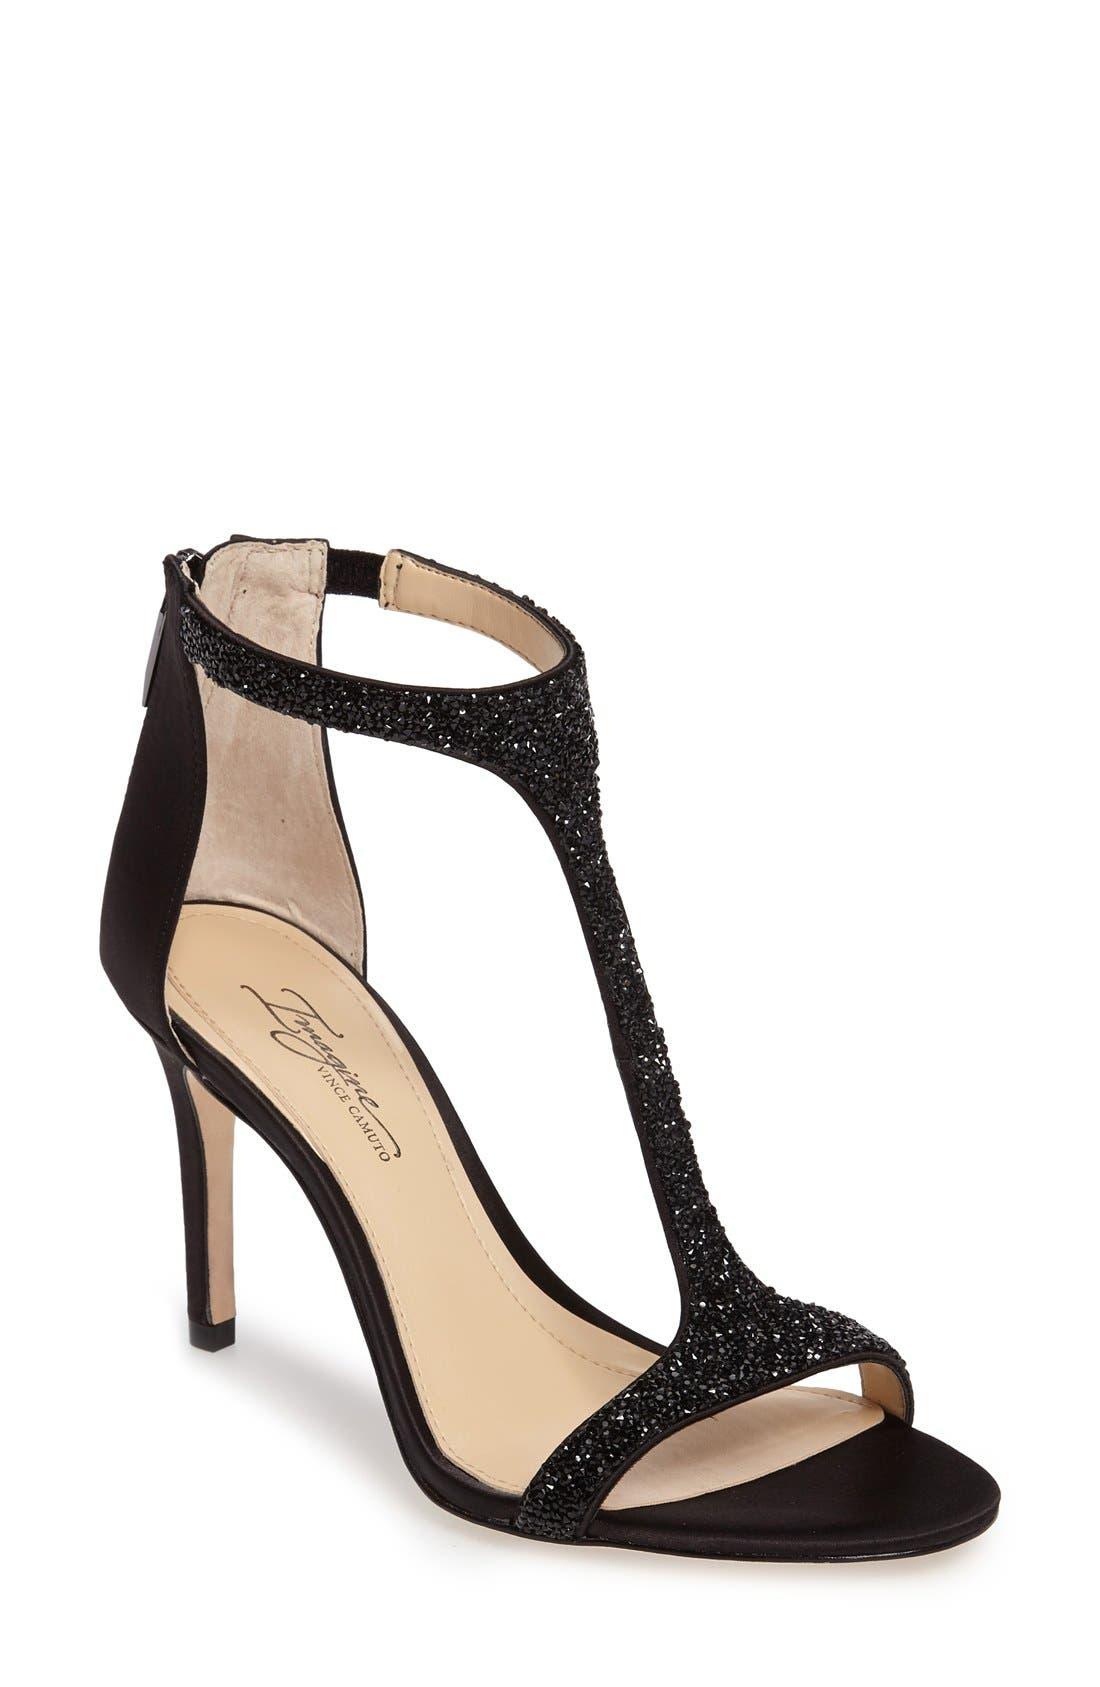 'Phoebe' Embellished T-Strap Sandal,                             Main thumbnail 1, color,                             Black Satin